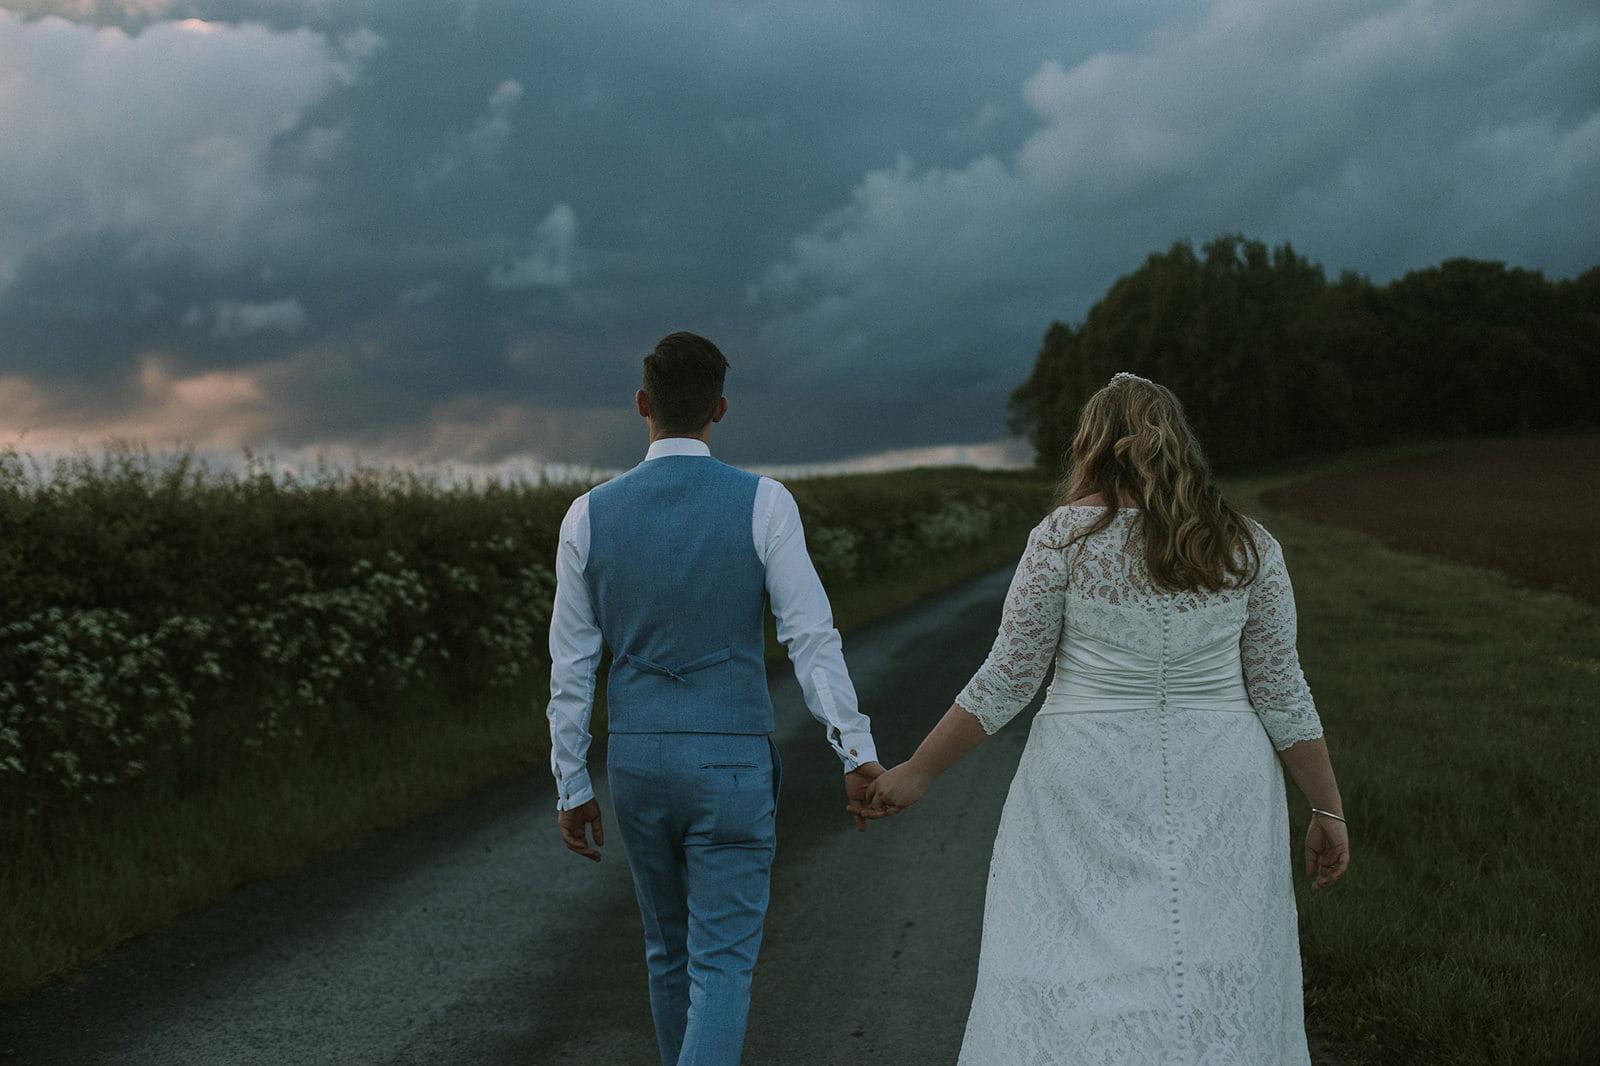 intimate wedding photography london